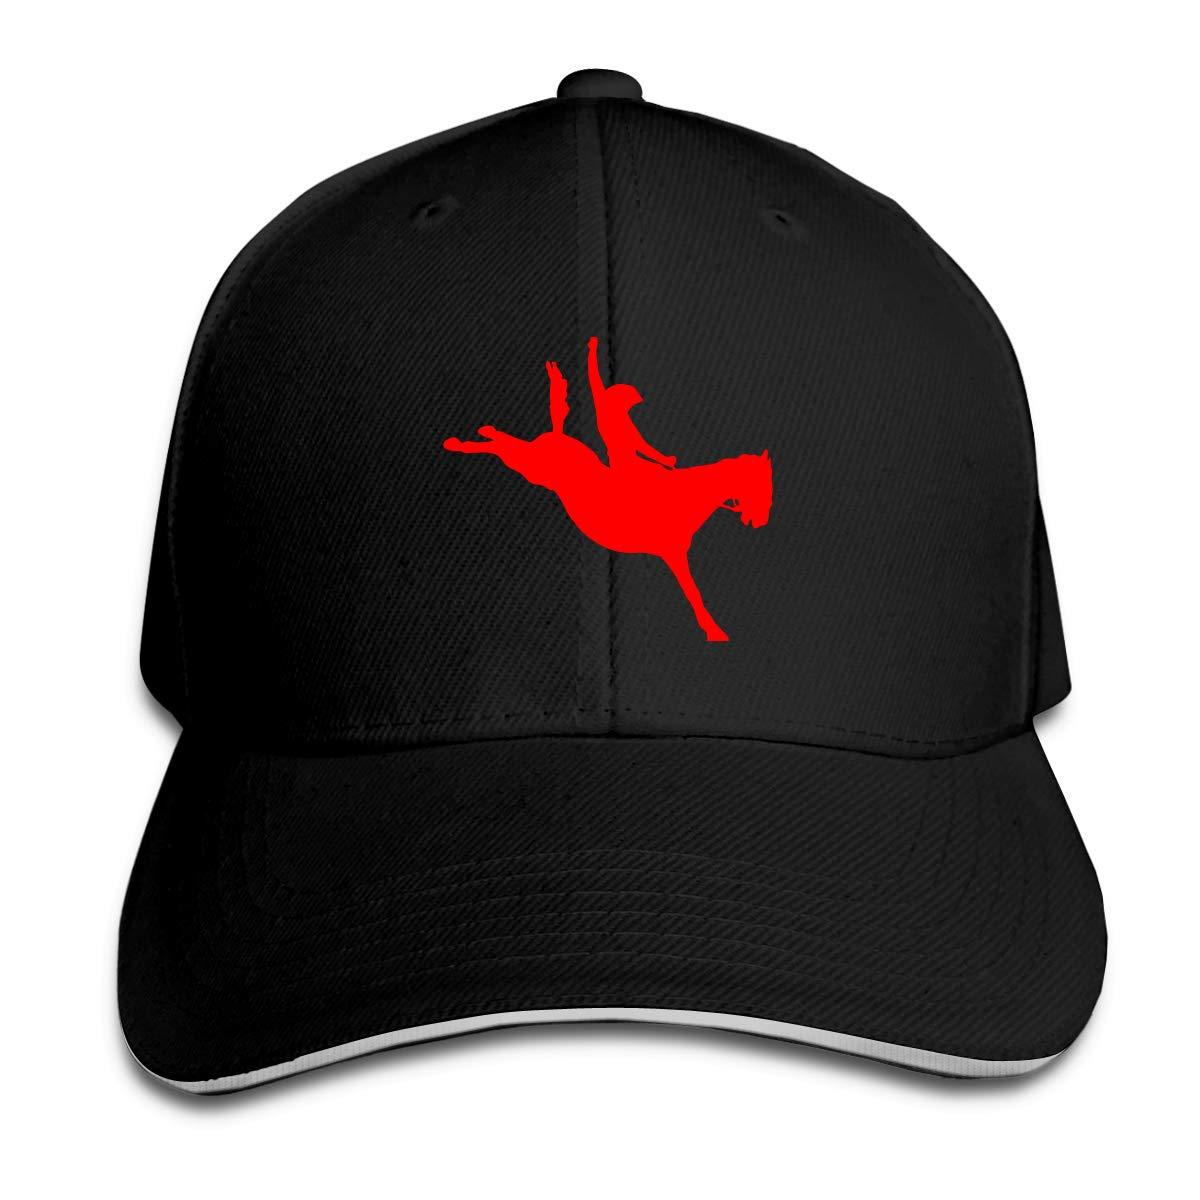 Cowboy Horse Rider2 Outdoor Snapback Sandwich Cap Adjustable Baseball Hat Street Rapper Hat